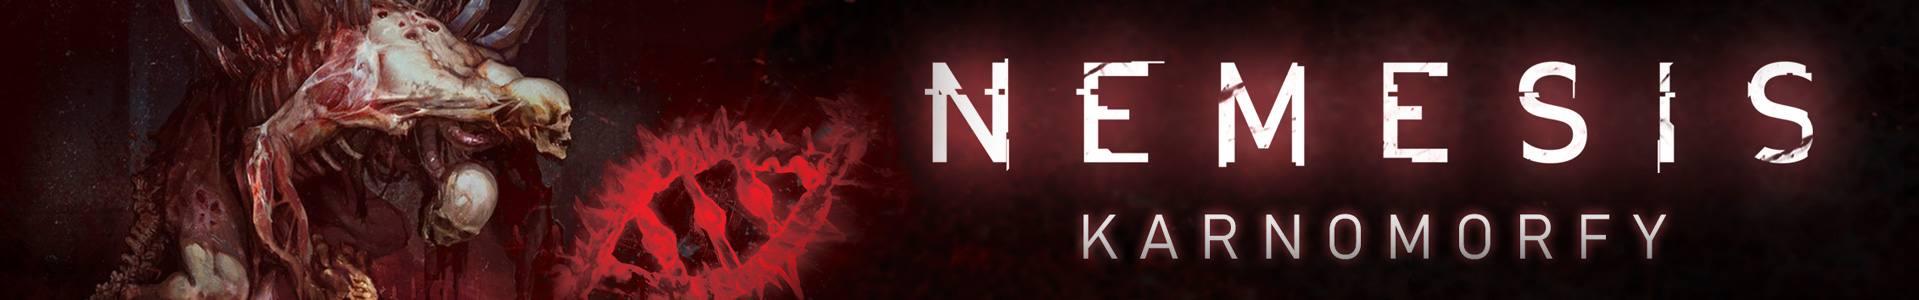 nemesis-karnomorfy